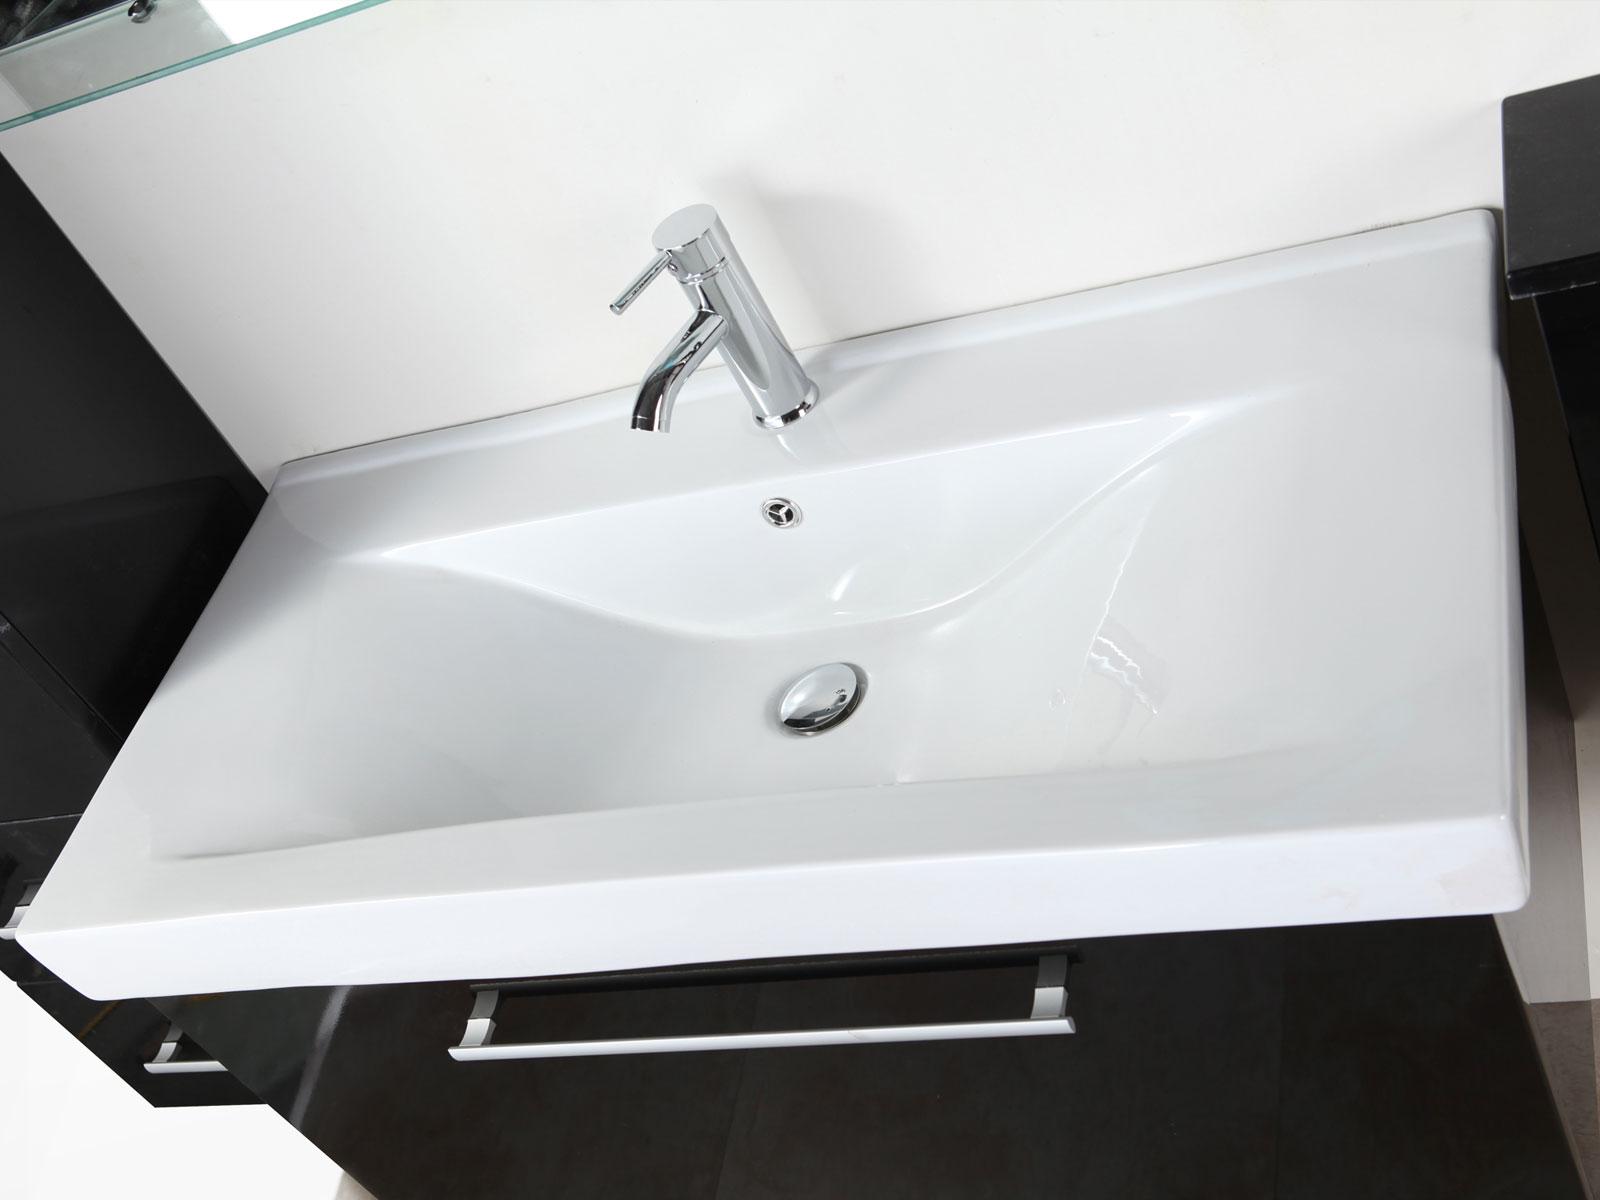 London meuble salle de bain 100 cm lavabo e colonne for Colonne salle de bain 100 cm